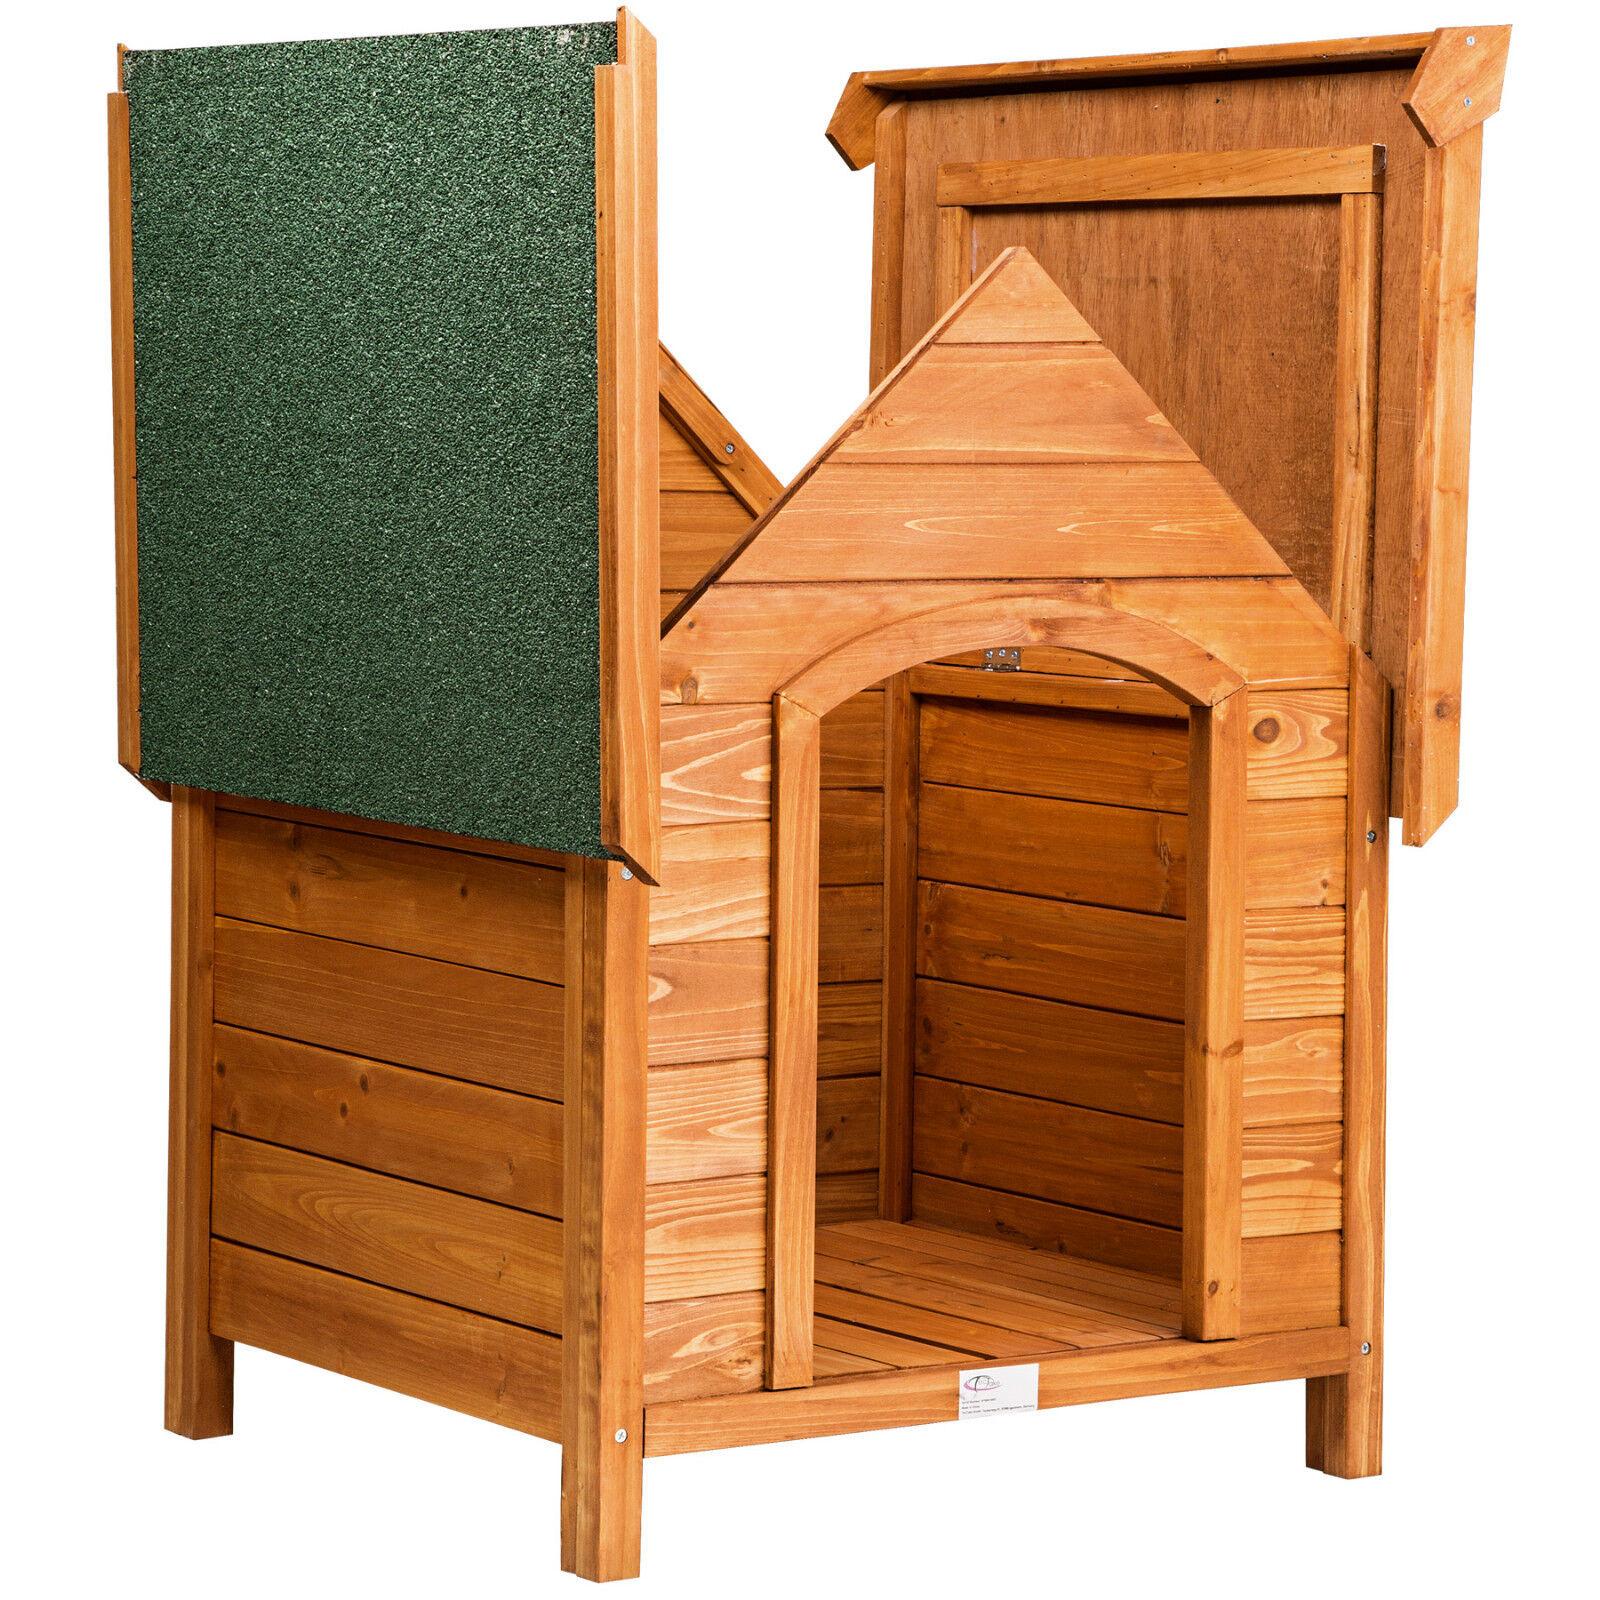 caseta xxl de madera maciza para perro tejado verde casa